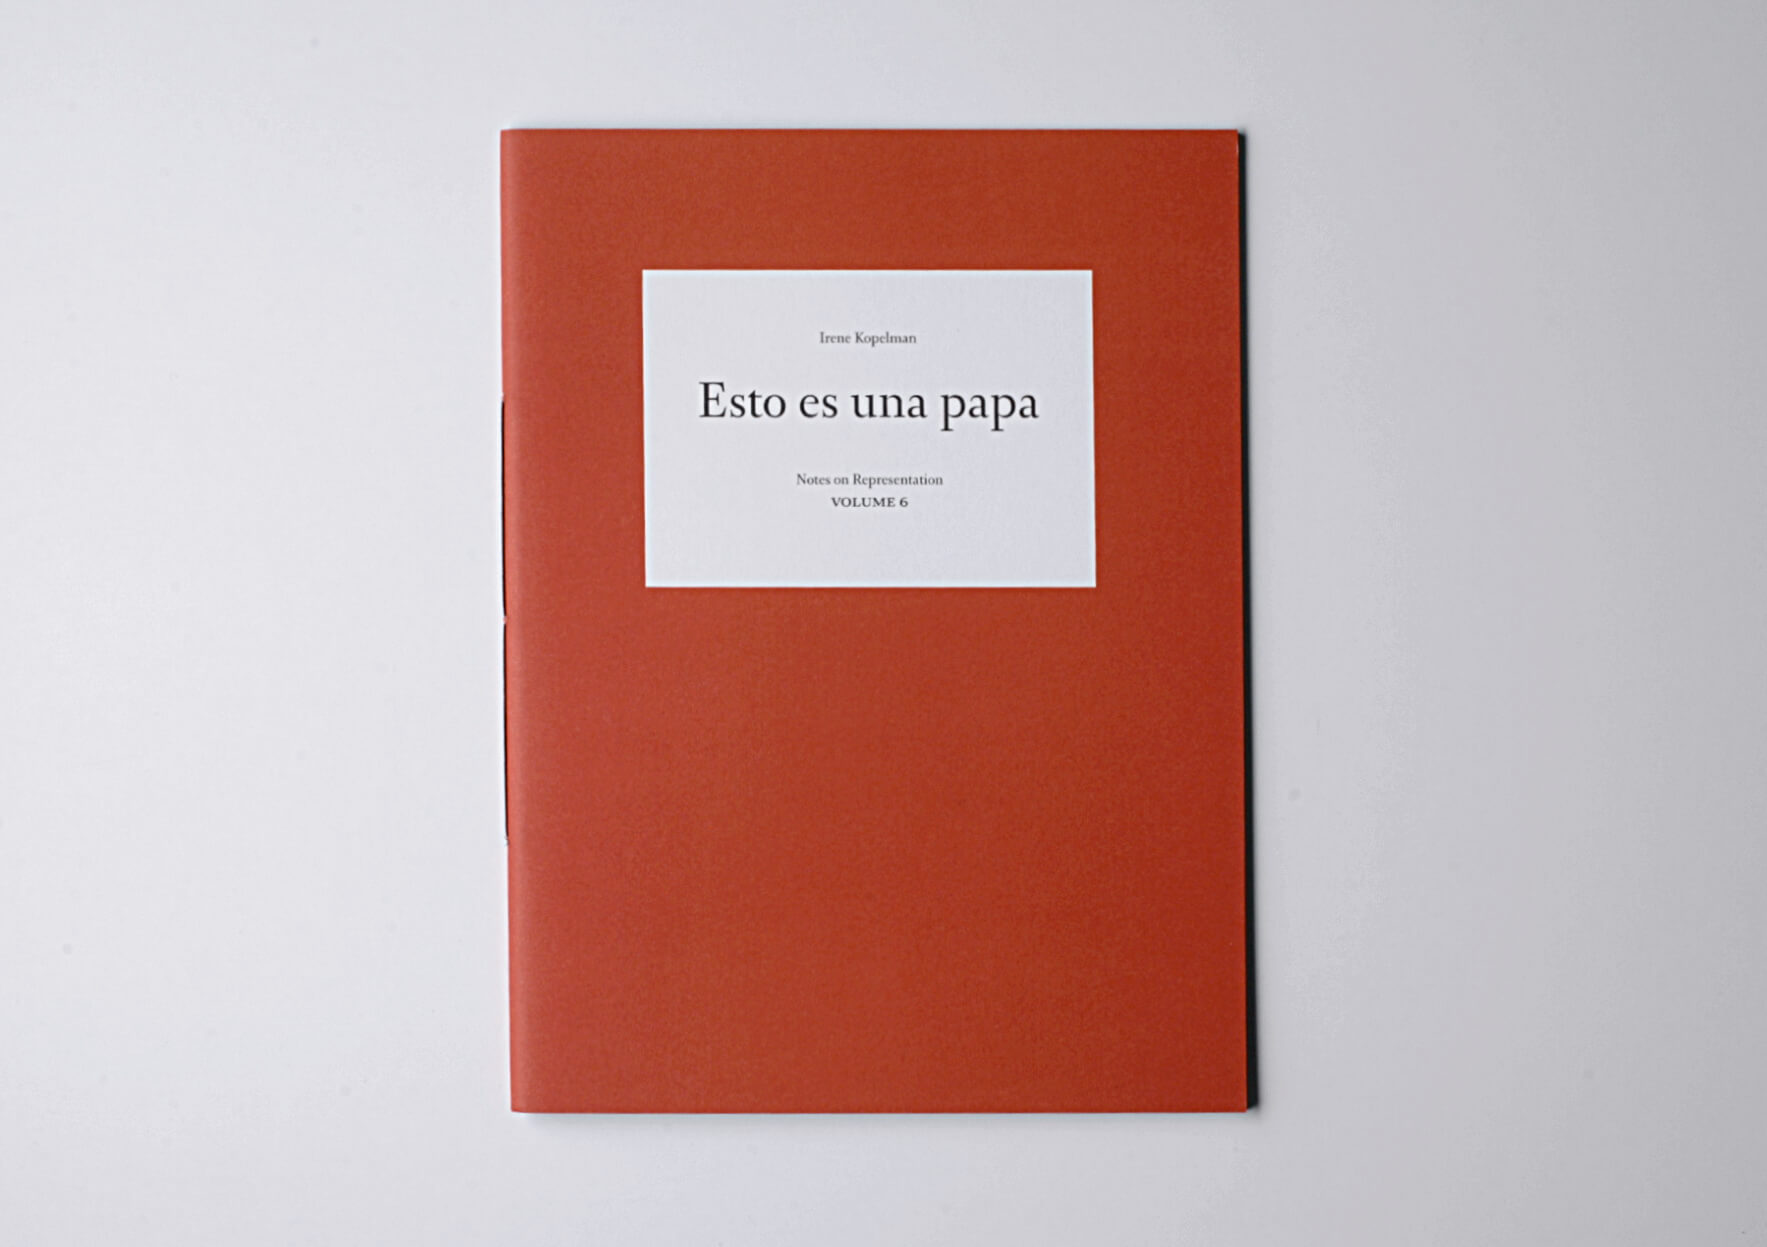 Irene Kopelman Esto es una papa. Notes on Representation V.6, 2015 28 x 21 cm, 48 p. Texts in English and Spanish. Ed. Roma Publications | Mother | ProjecteSD